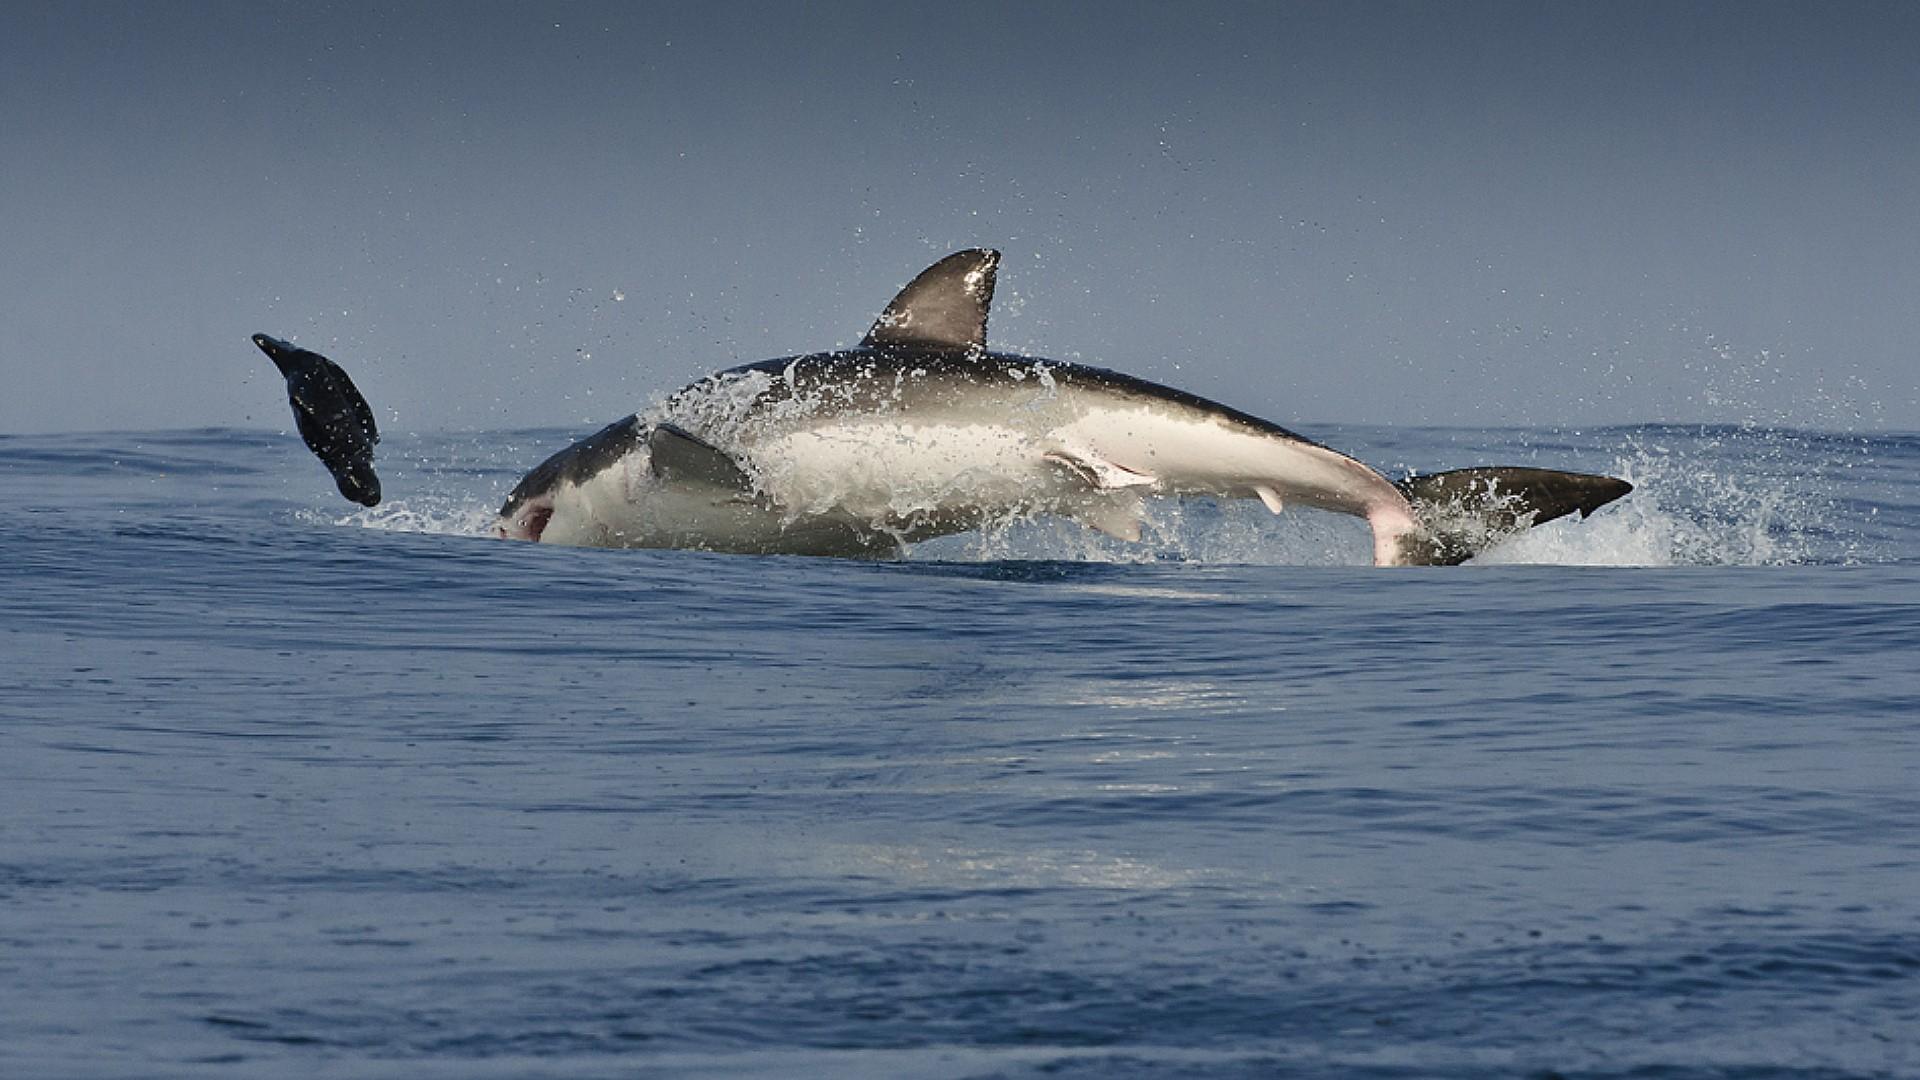 Cute Baby Dolphin Wallpaper Shark Wallpaper Hd Pixelstalk Net